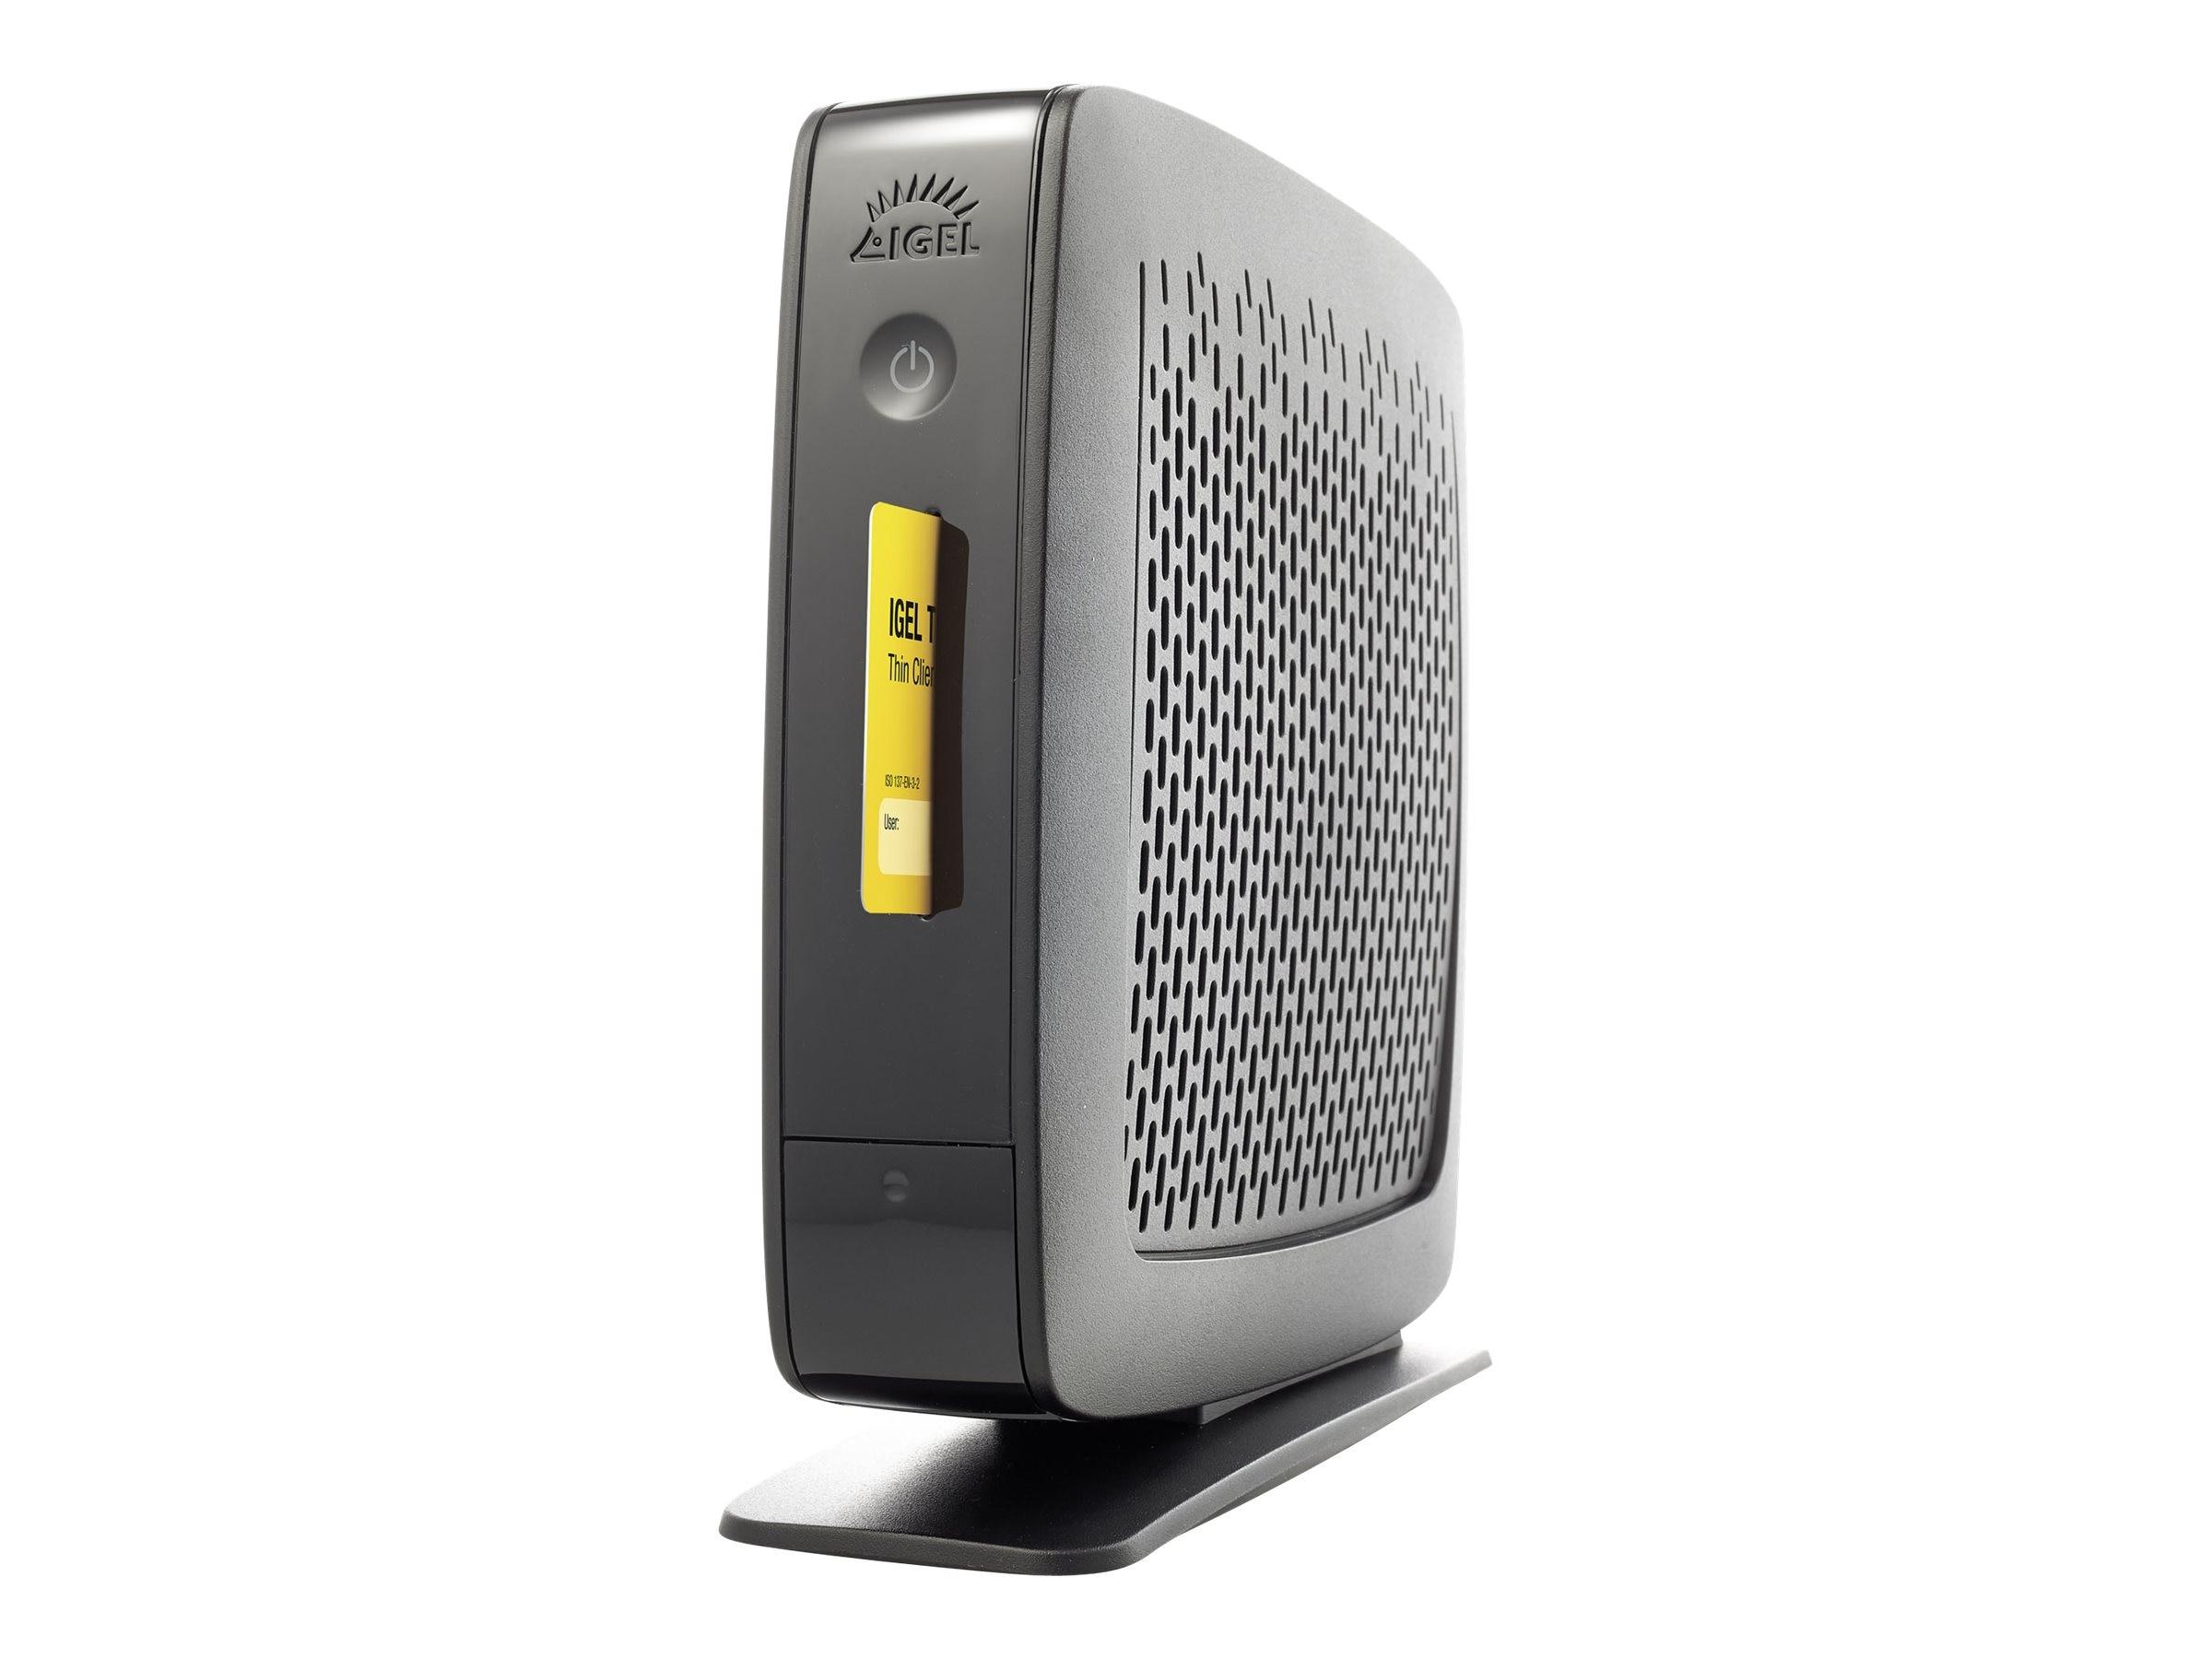 IGEL UD3 Universal Desktop Thin Client VIA Eden X2 1.0GHz 2GB RAM 4GB Flash GbE WES7